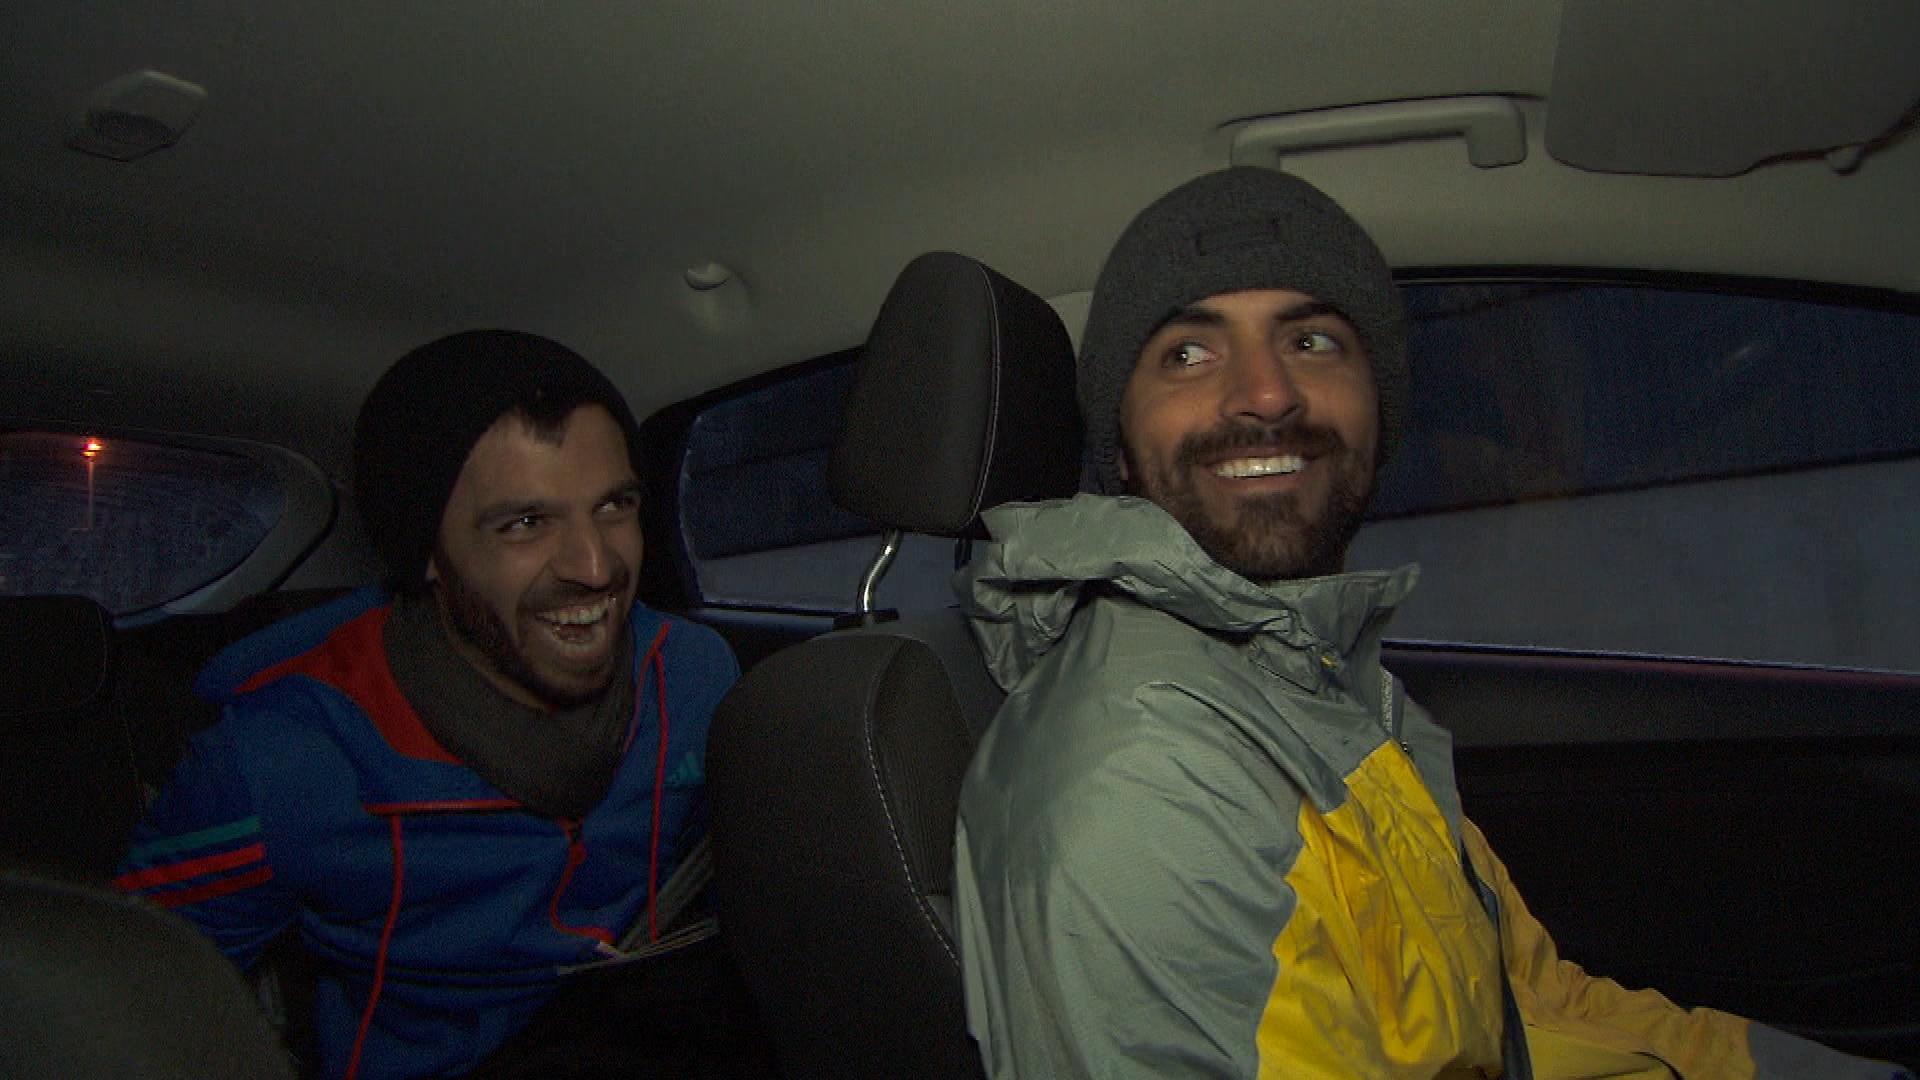 Leo and Jamal in Season 24 Episode 9